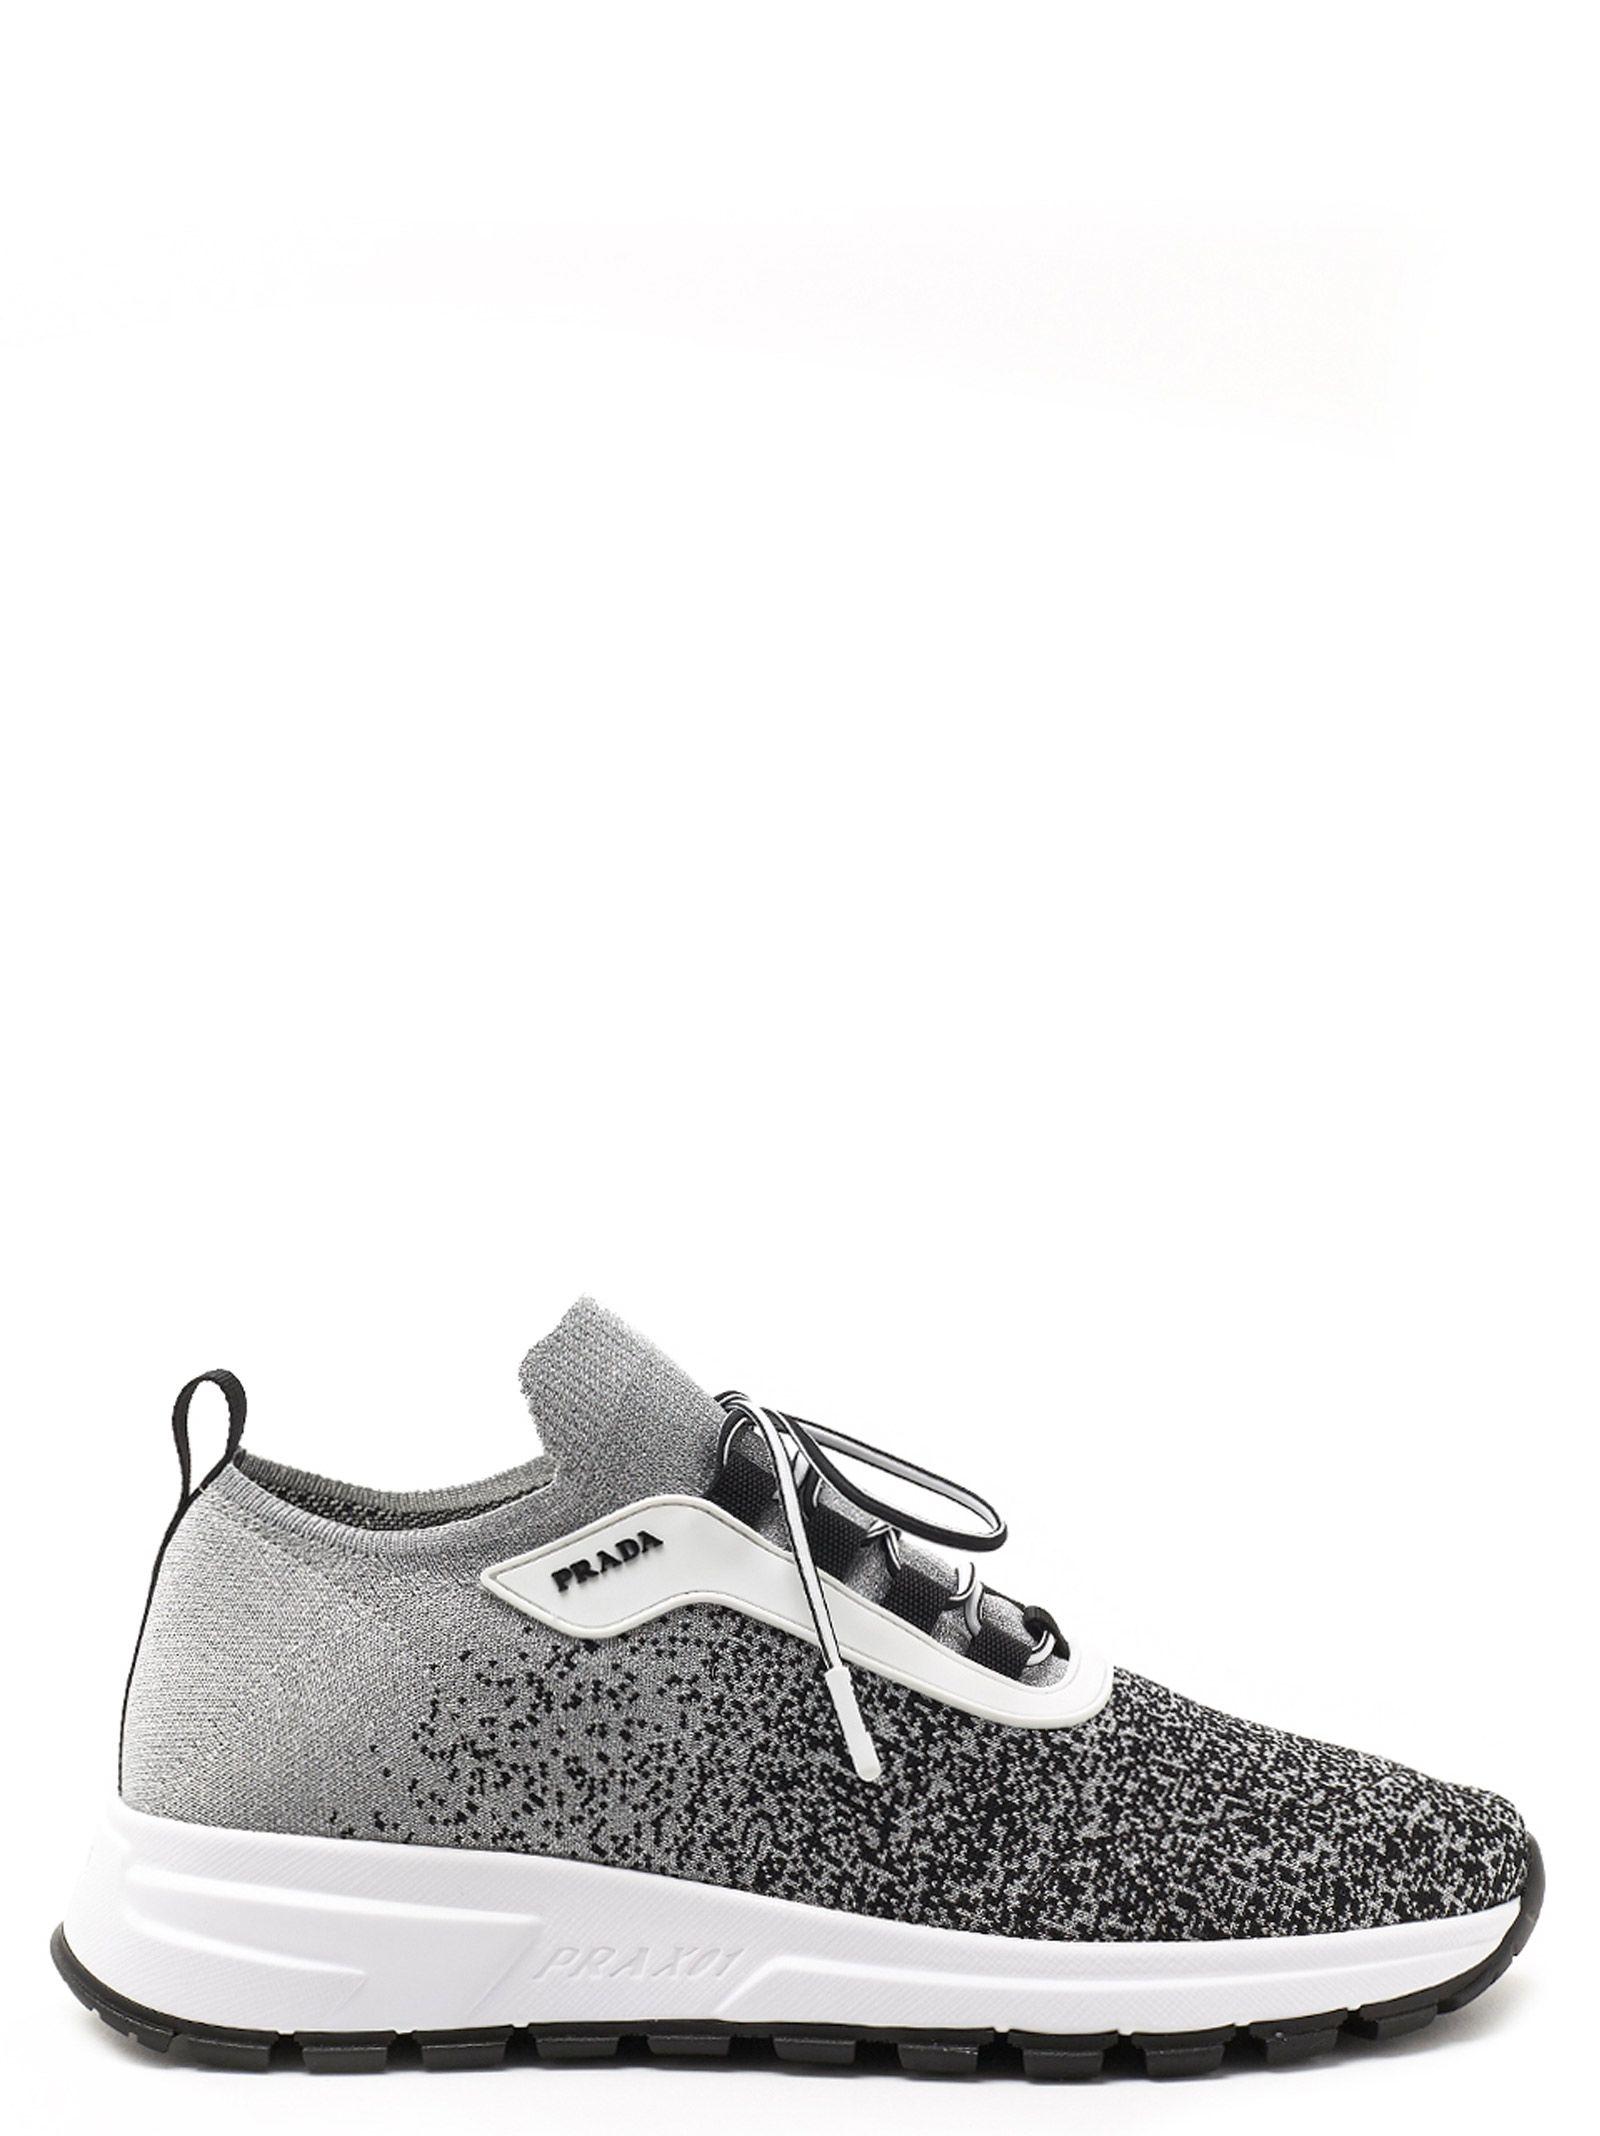 f23afa3c8441 Prada Prada  prax01  Shoes - Silver - 10796976